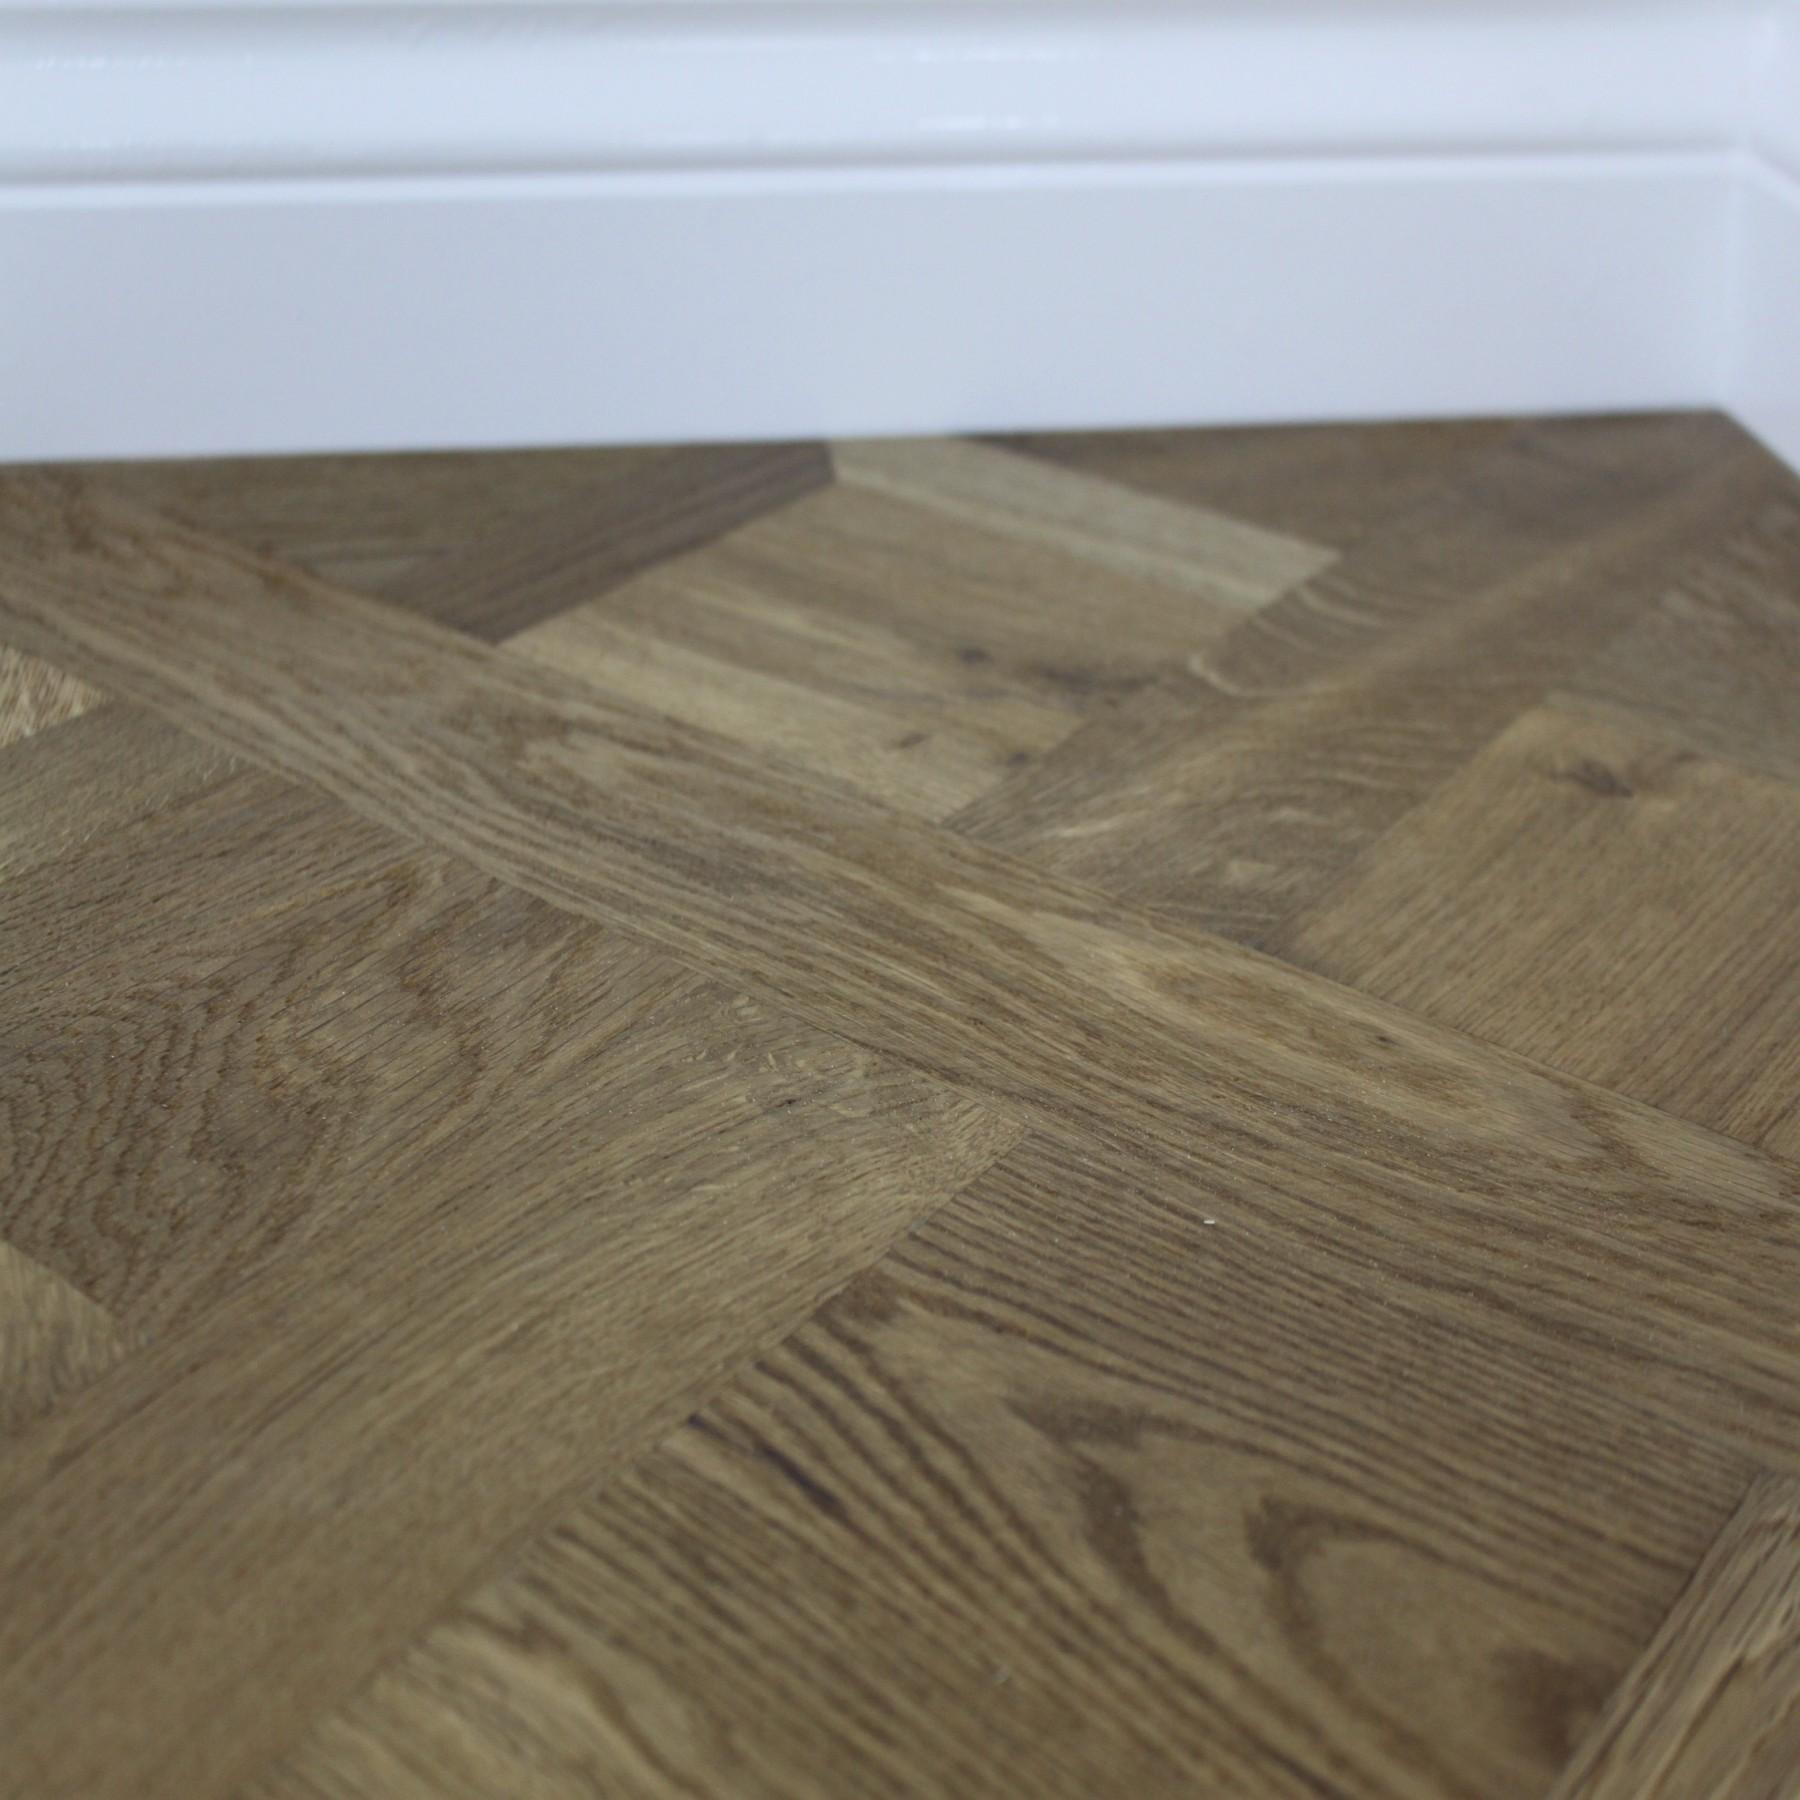 Maxi Versailles Panels Natural Smoked Oak Oiled Engineered Wood Flooring  580x580mm